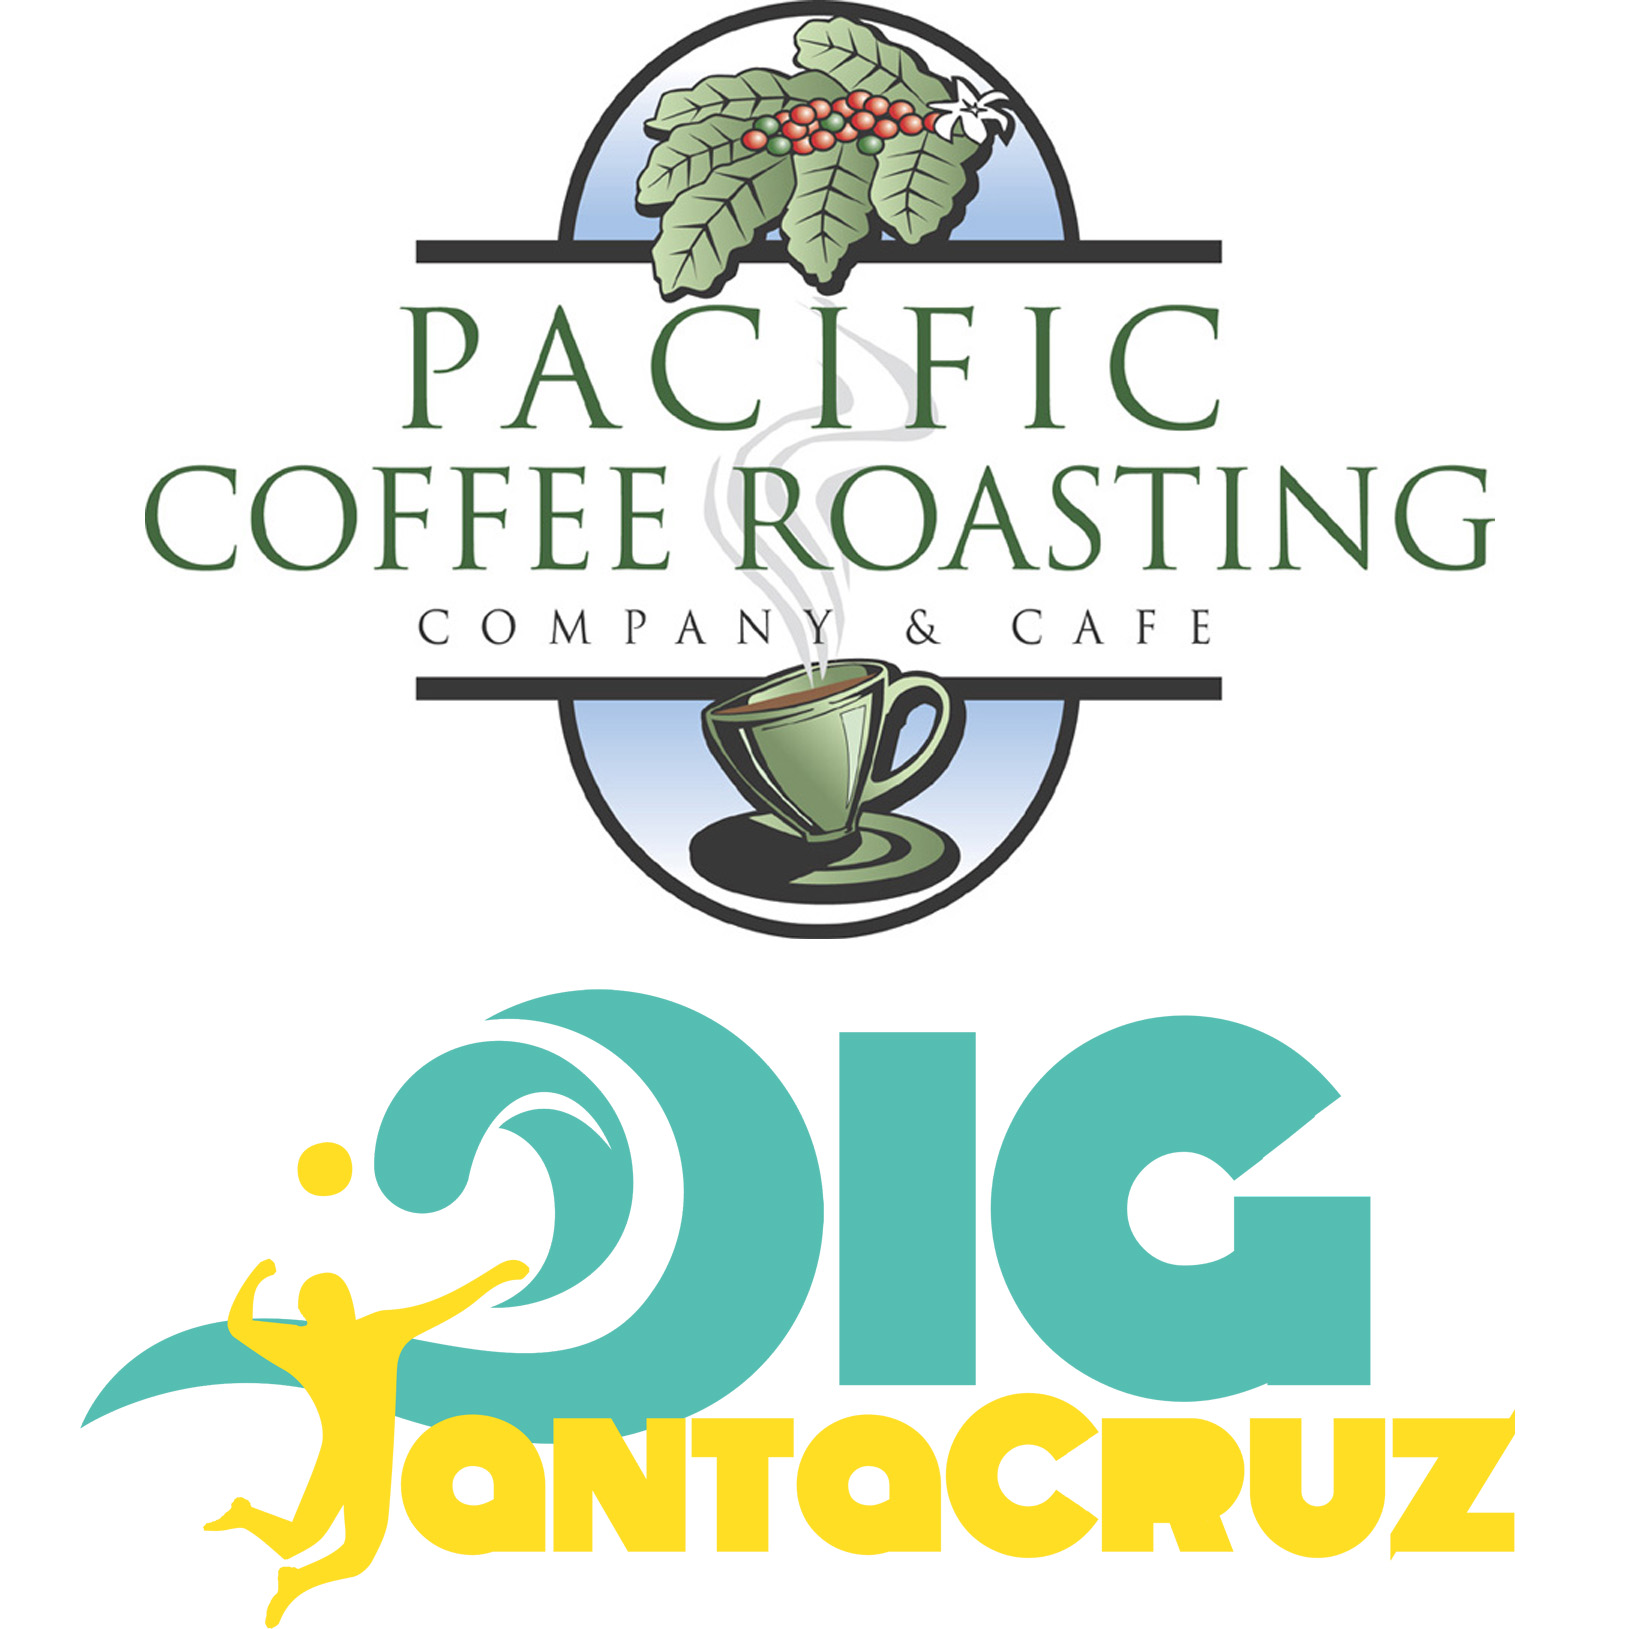 Pacific Coffee_Dig SC logos.jpg